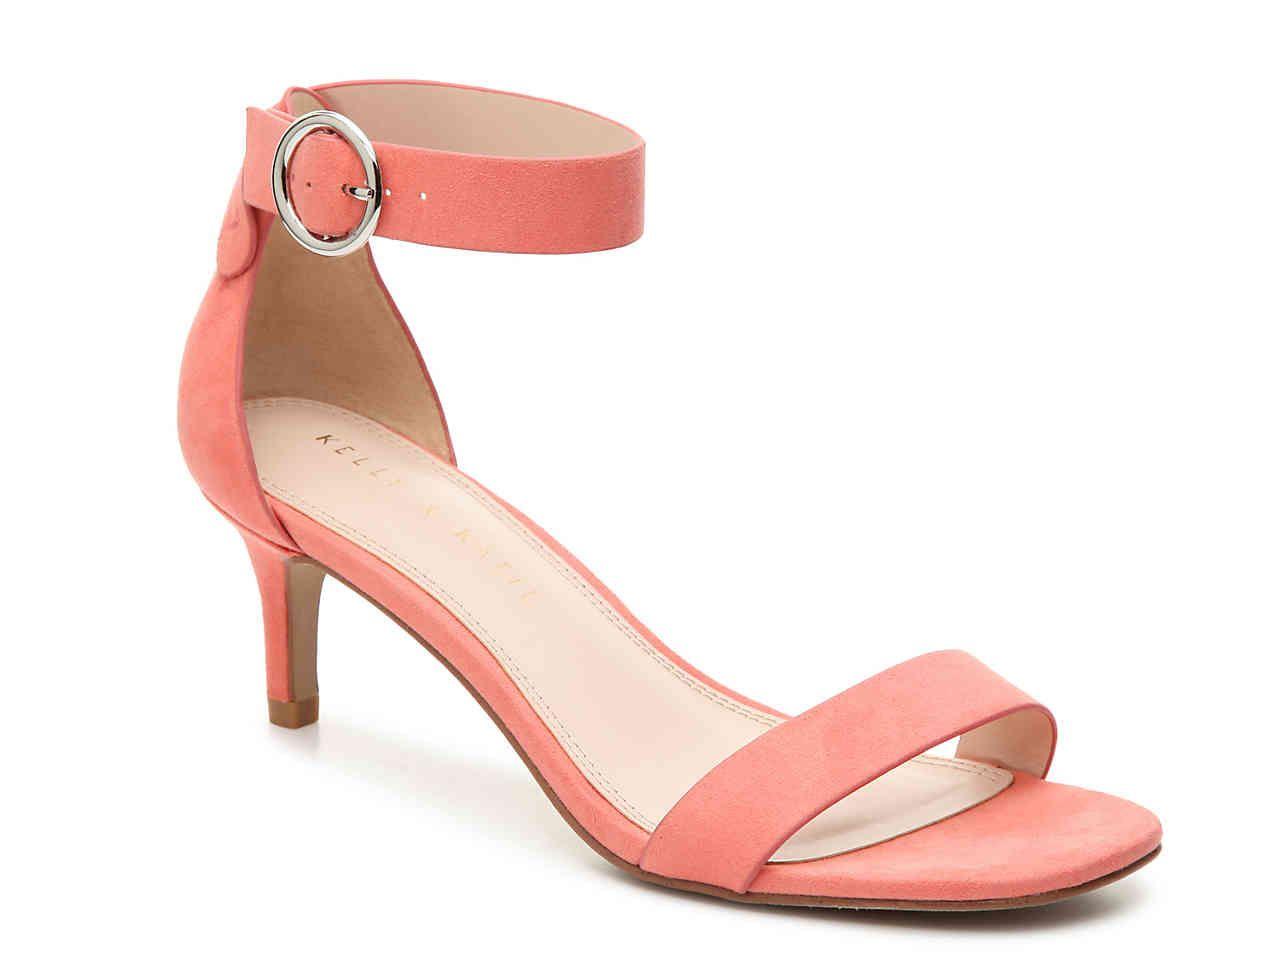 bfc8eb77da Women Kirstie Sandal -Dark Navy Faux Patent | Products | Shoes ...